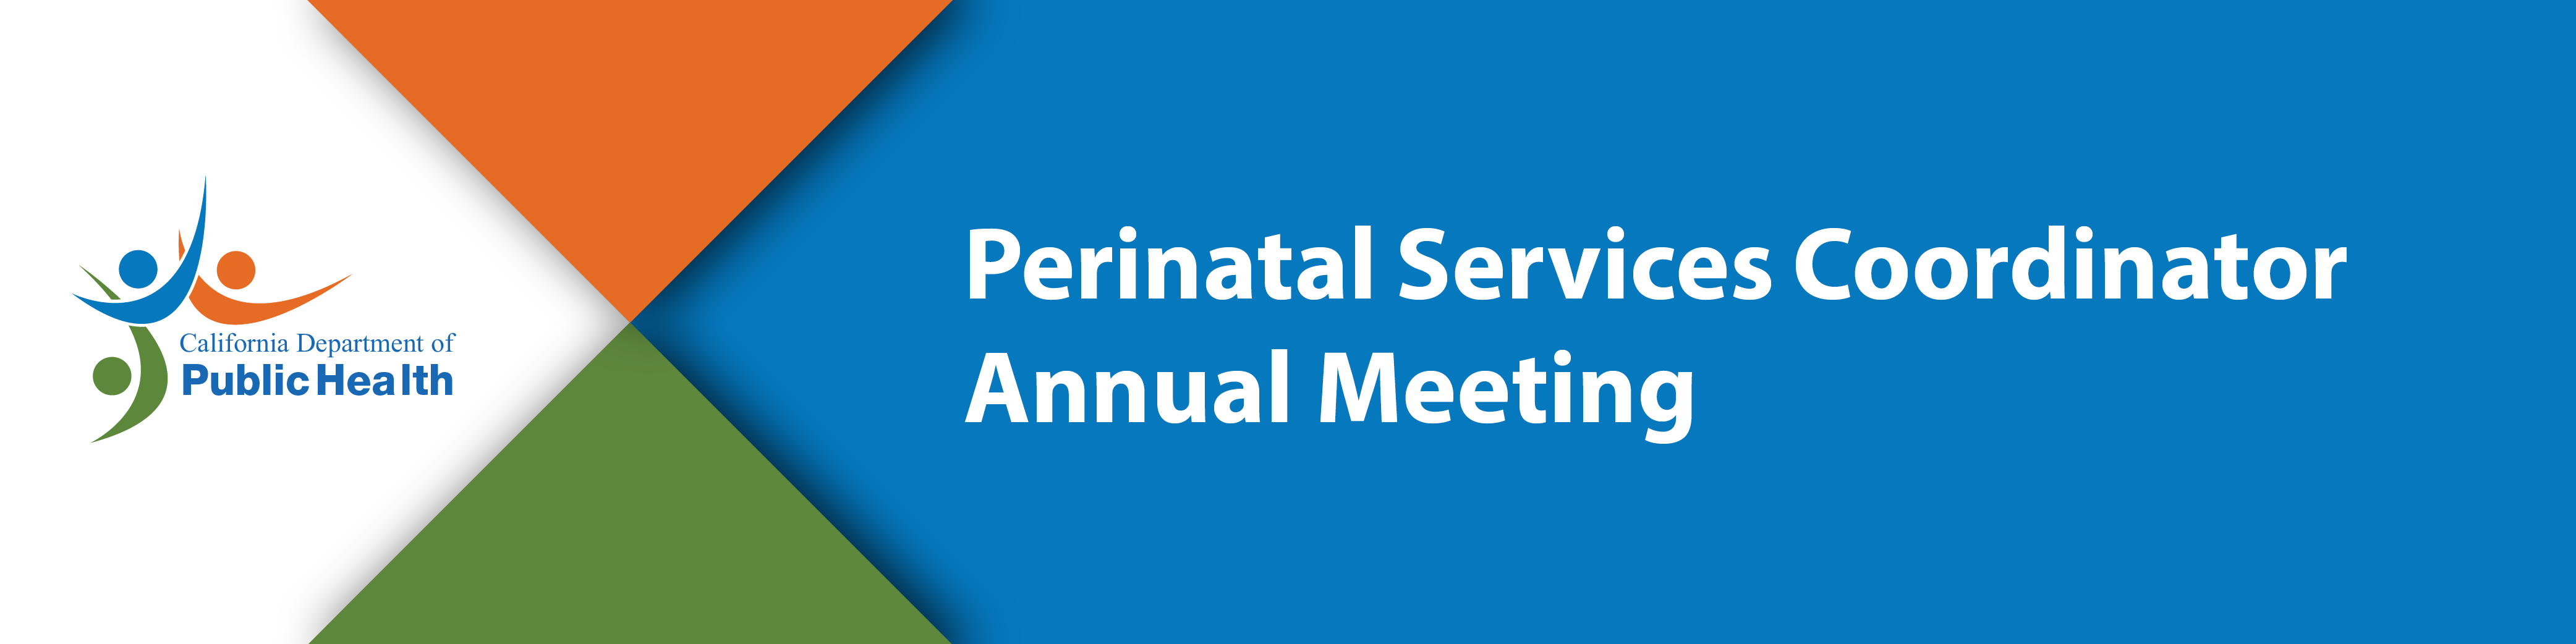 2017 CPSP Perinatal Services Coordinators' Annual Meeting